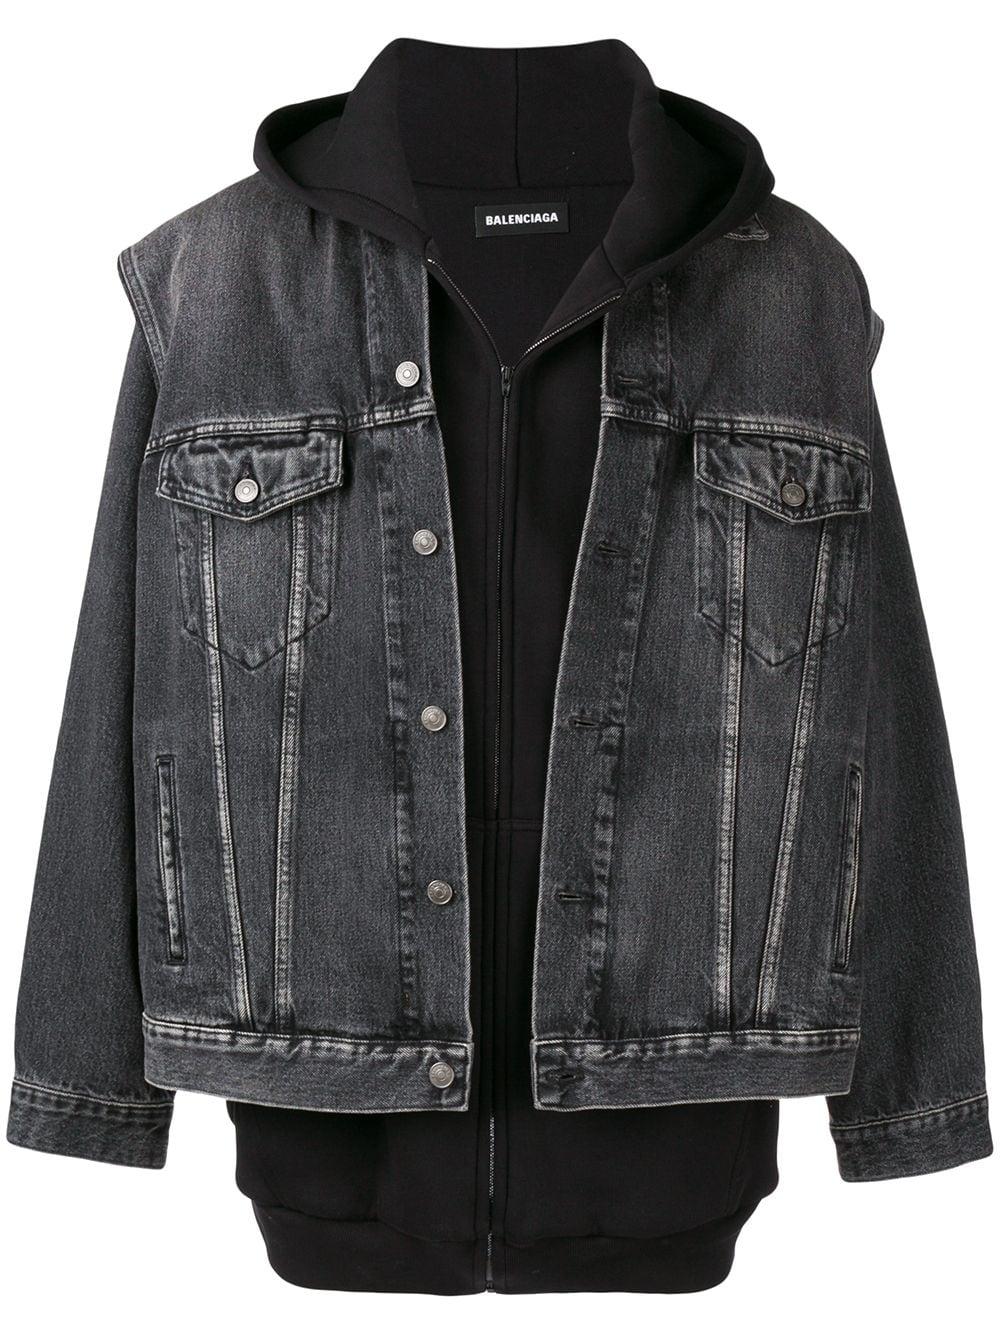 Balenciaga Twinset Hoodie Denim Jacket In Black Modesens Denim Jacket With Hoodie Embellished Denim Jacket Black Denim Jacket